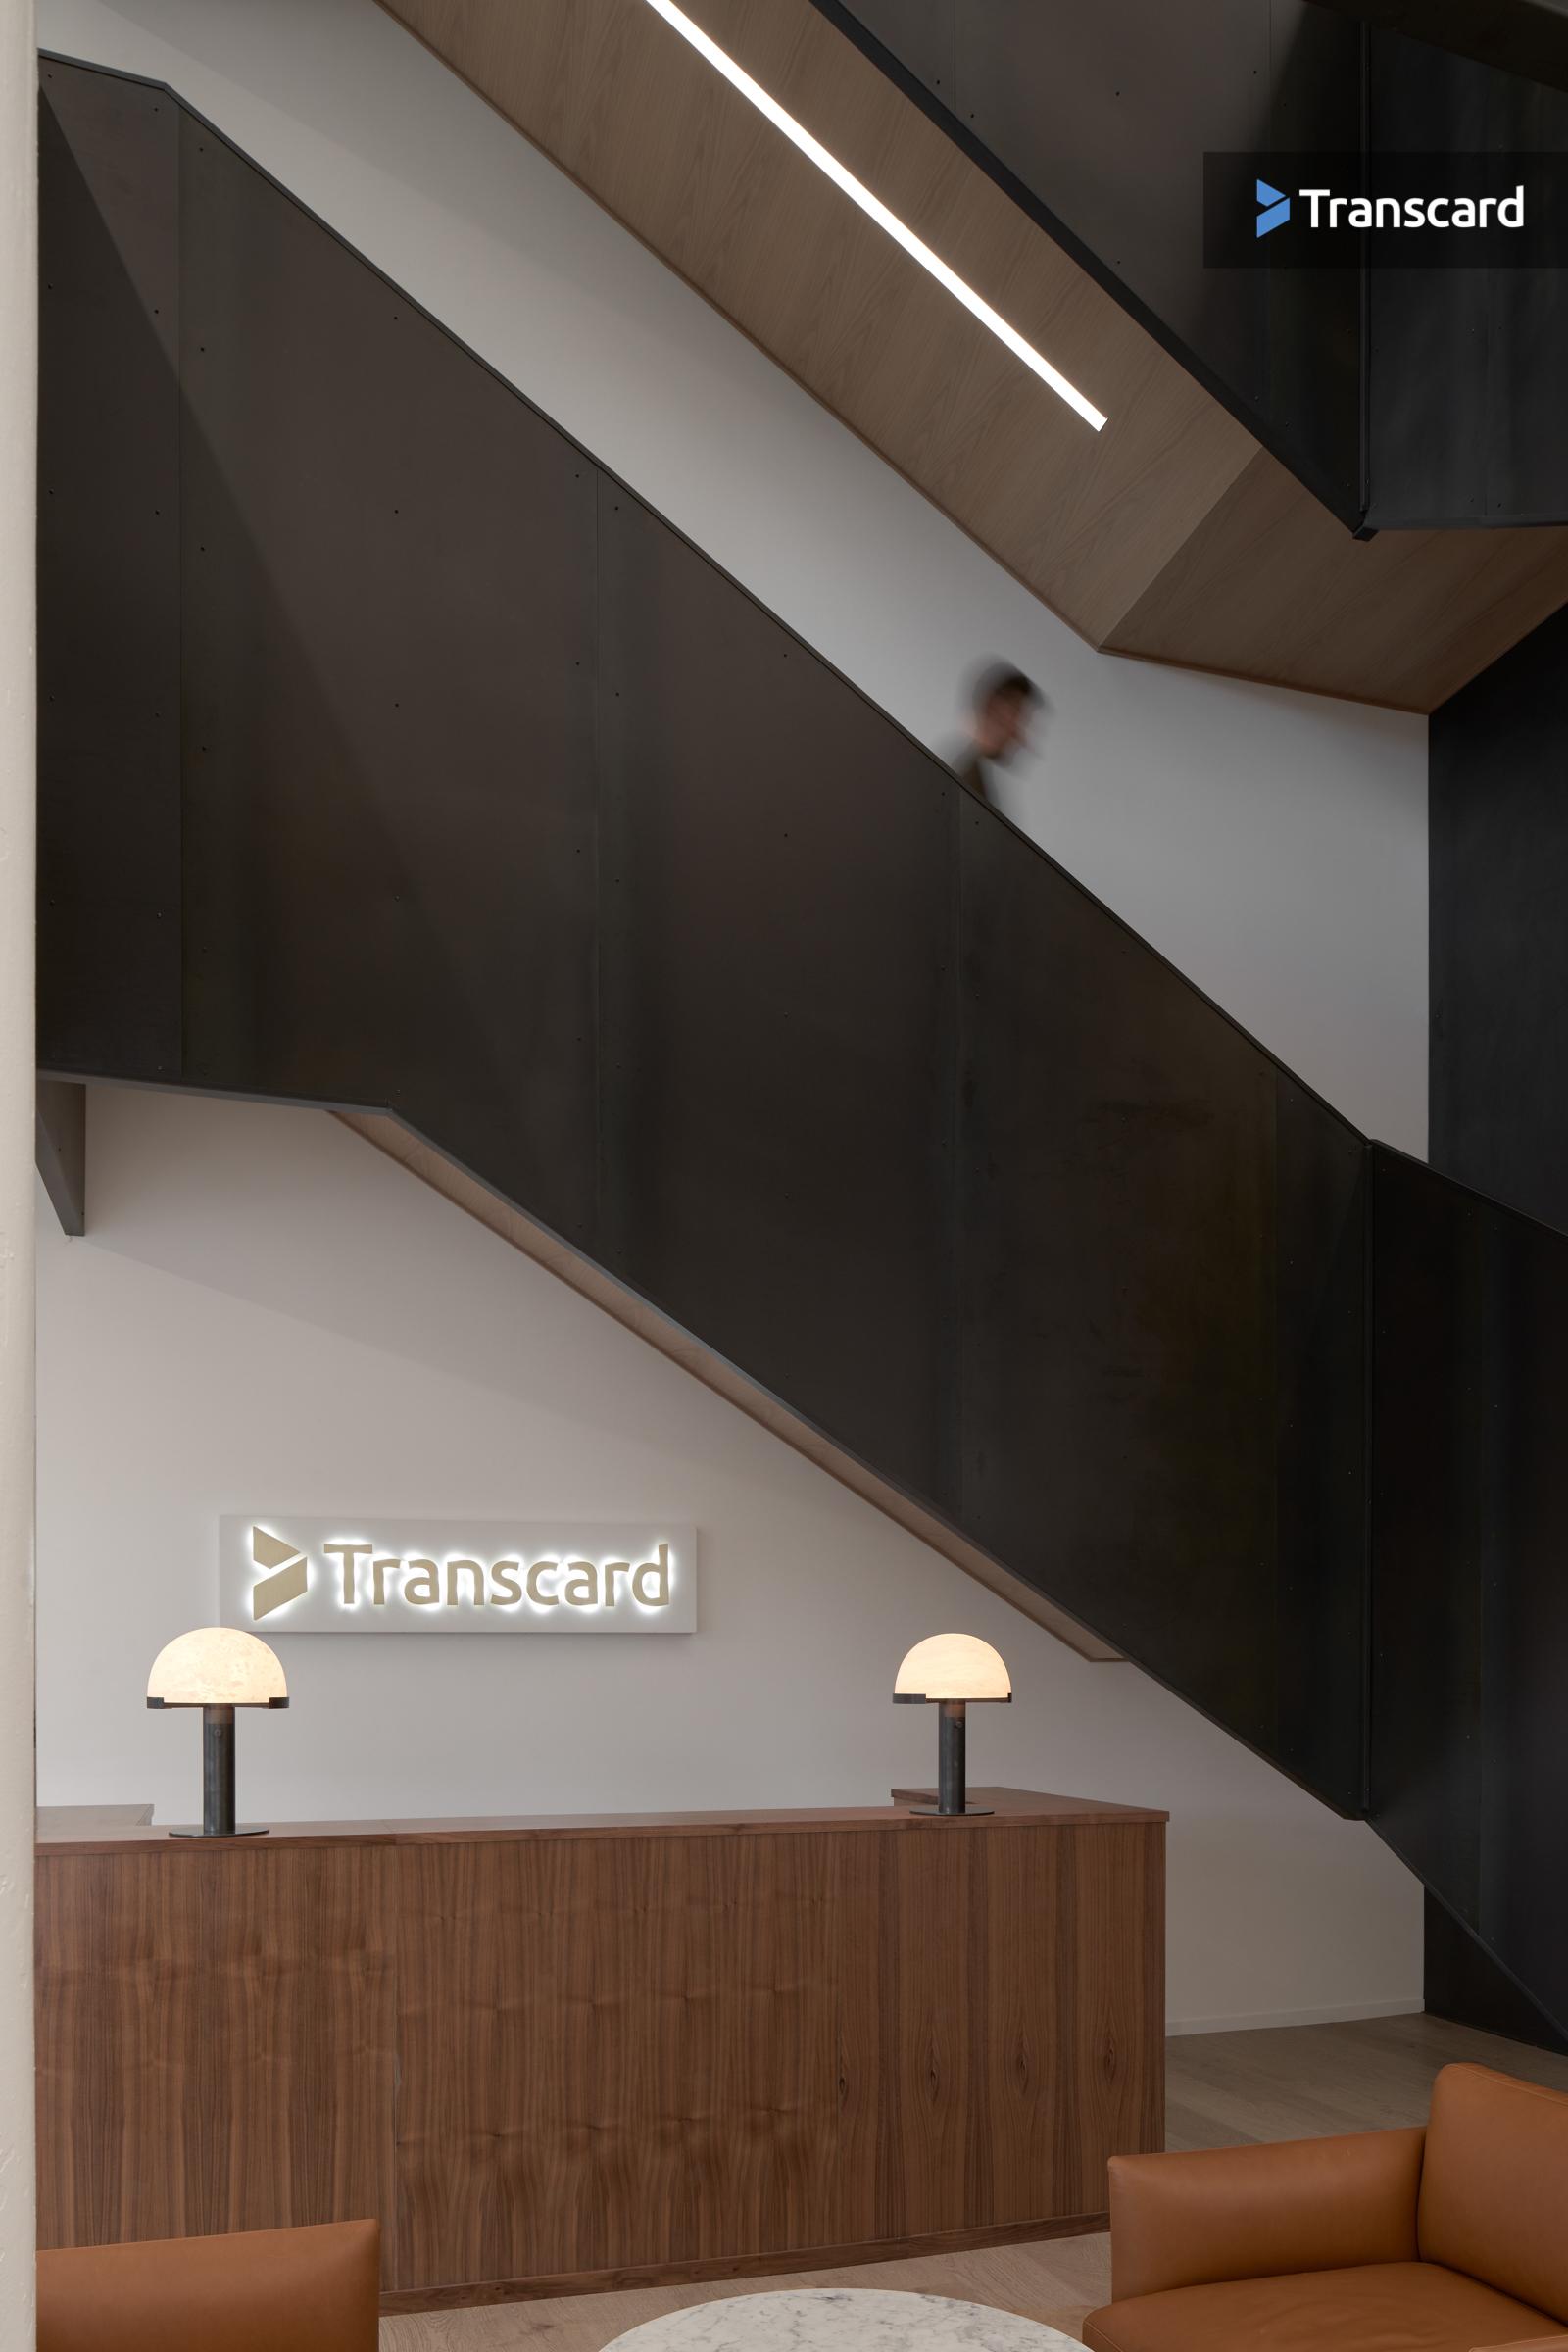 PTA Transcard 31r